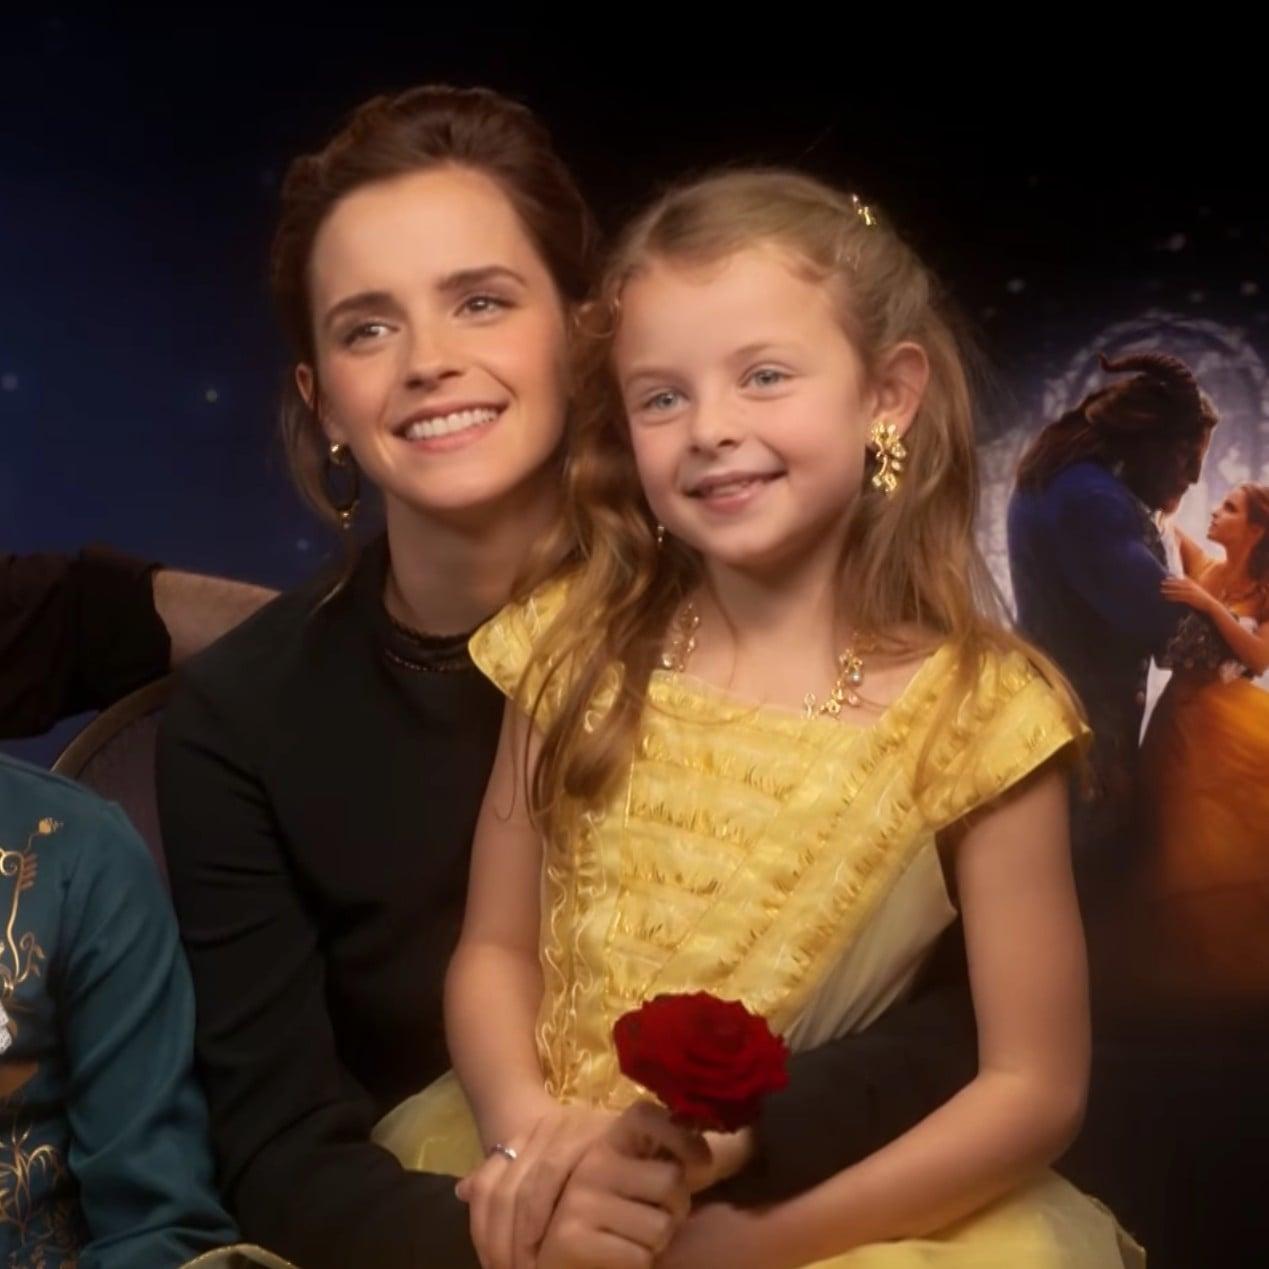 Emma Watson Dan Stevens Interview With Mini Belle And Beast